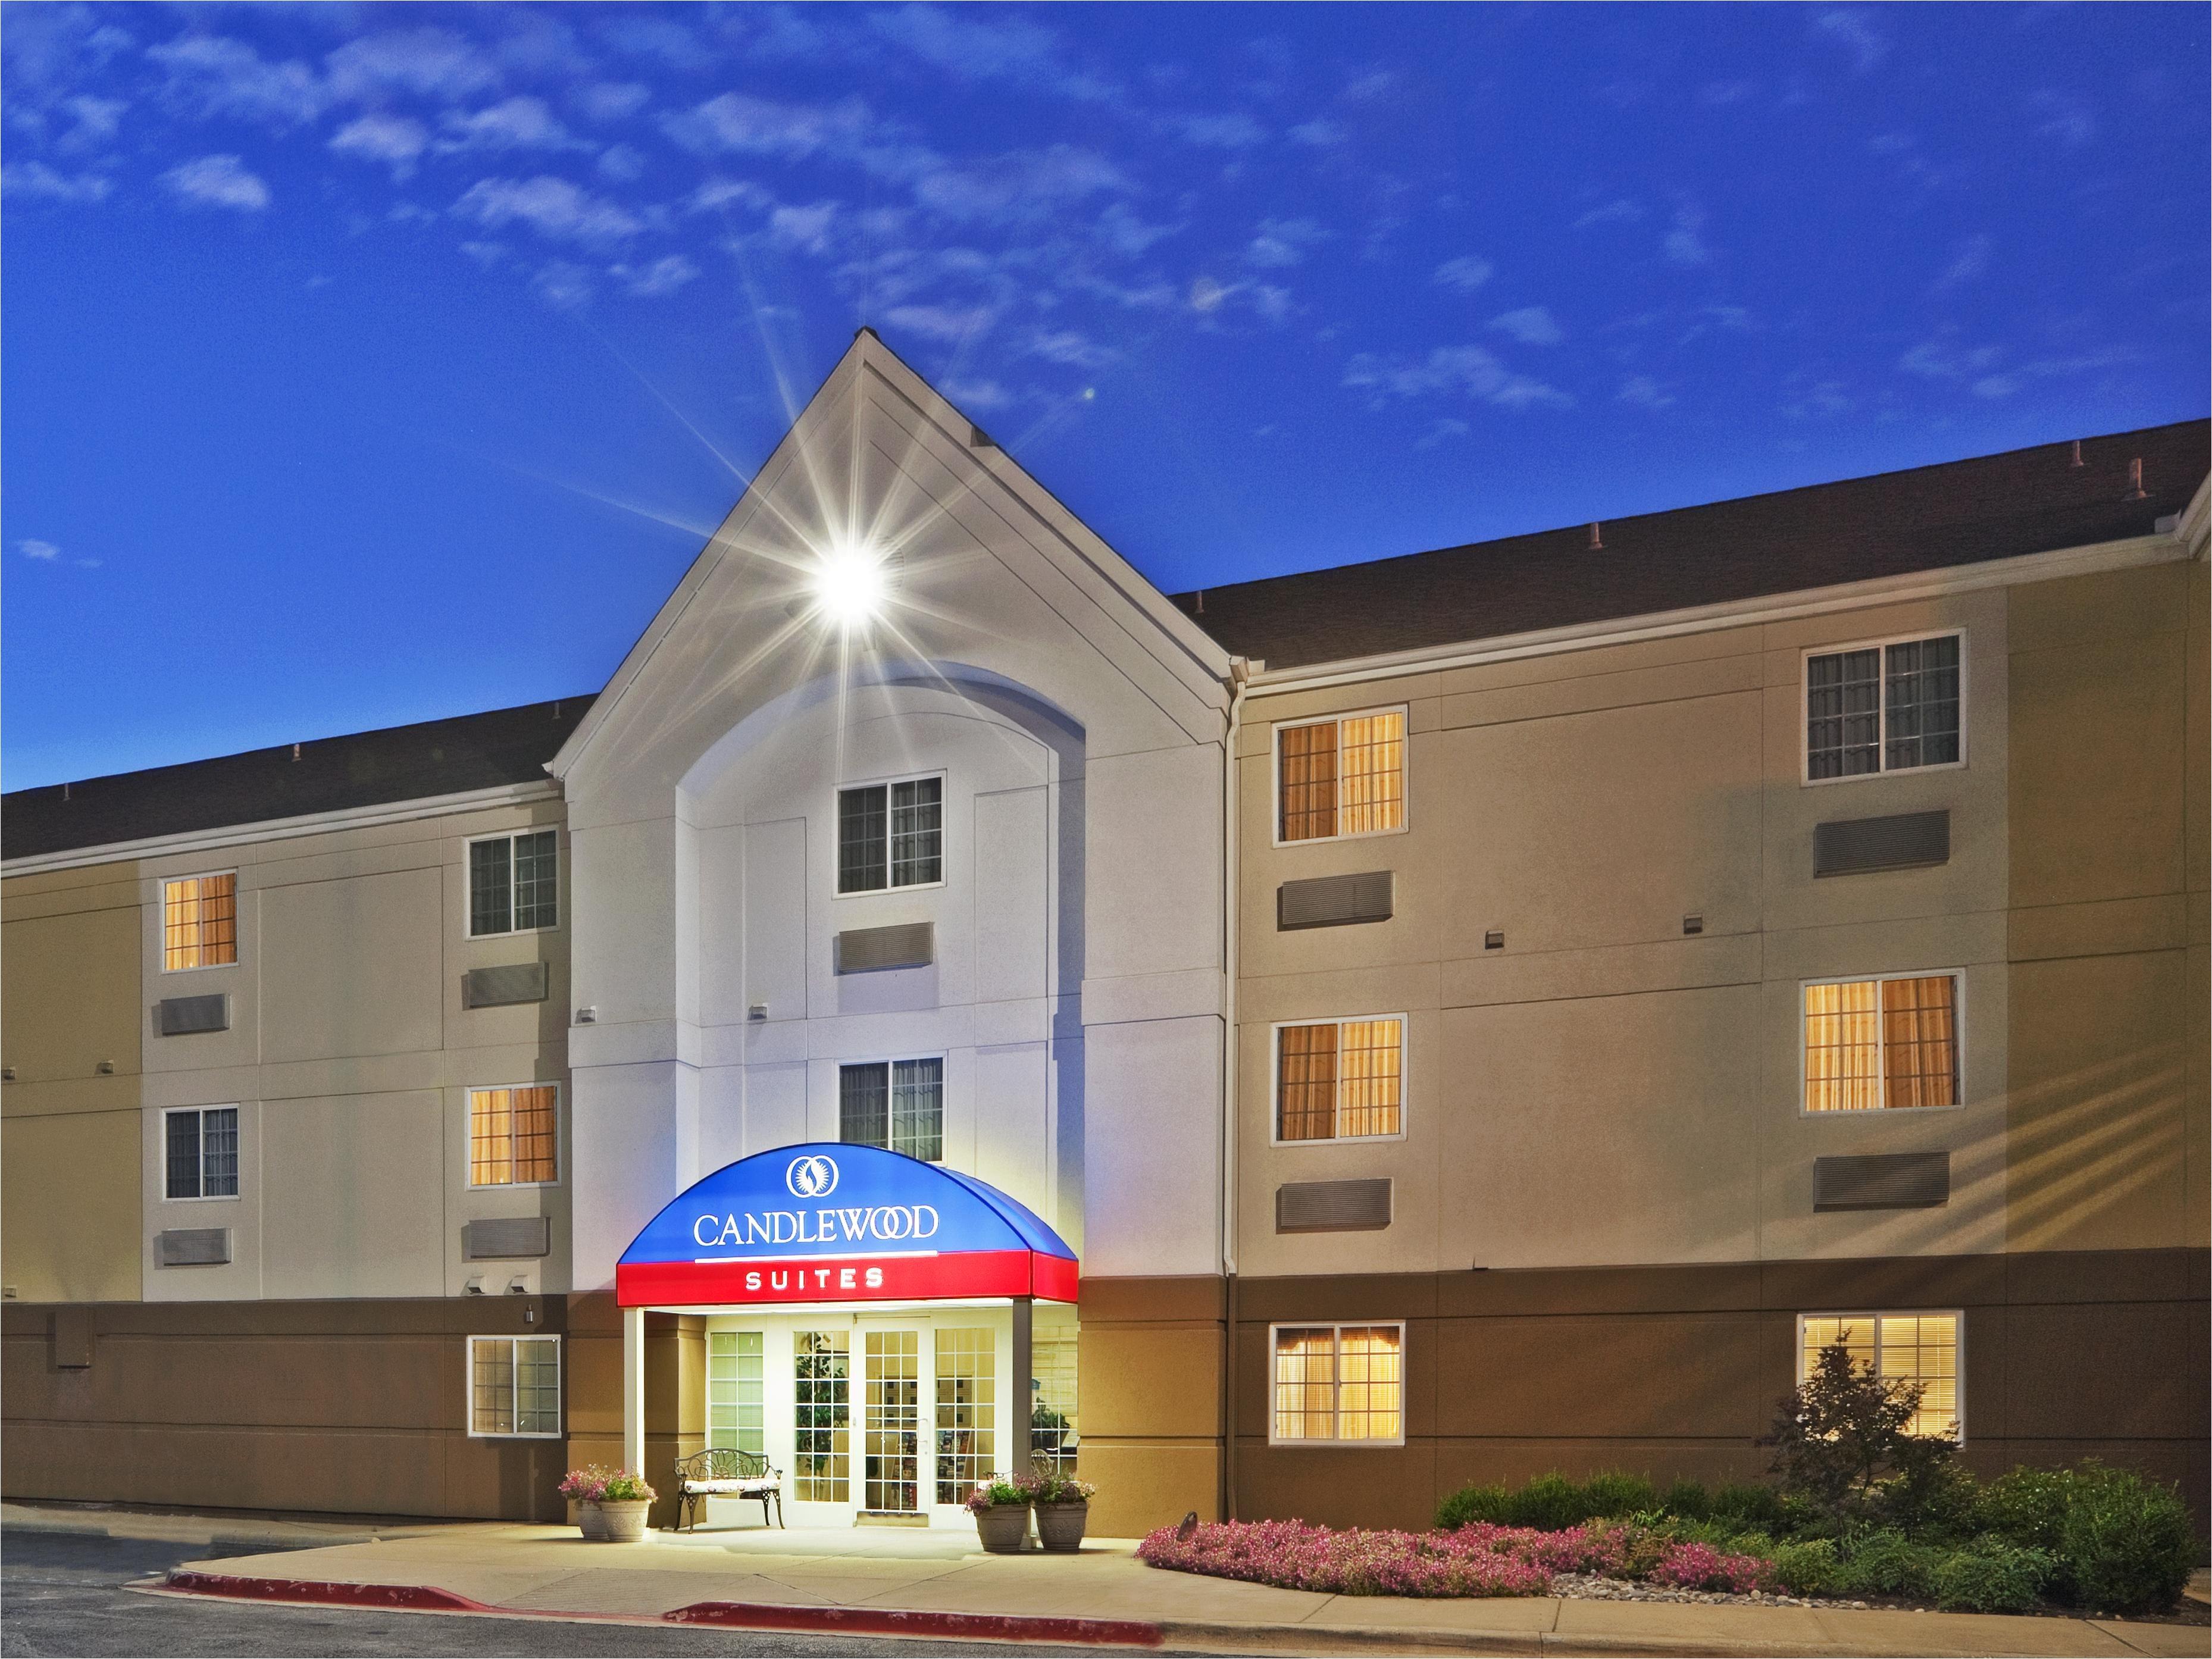 candlewood suites dallas 2532337448 4x3